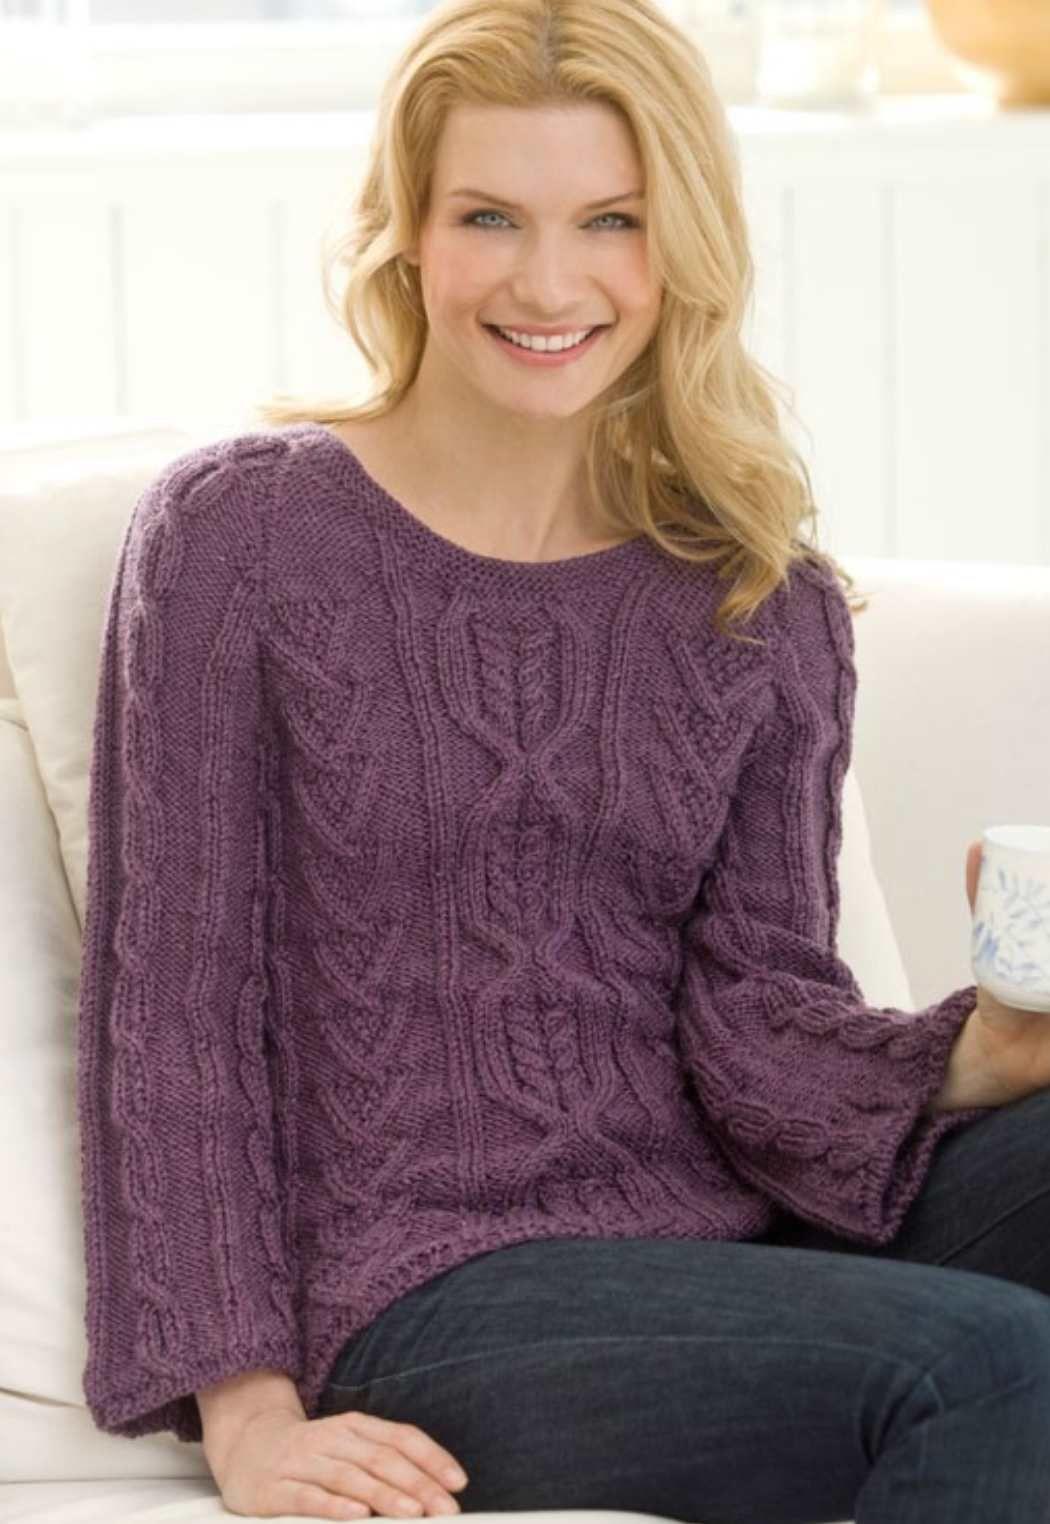 New Aran Sweater Free Knitting Pattern | Pinterest | Aran sweaters ...